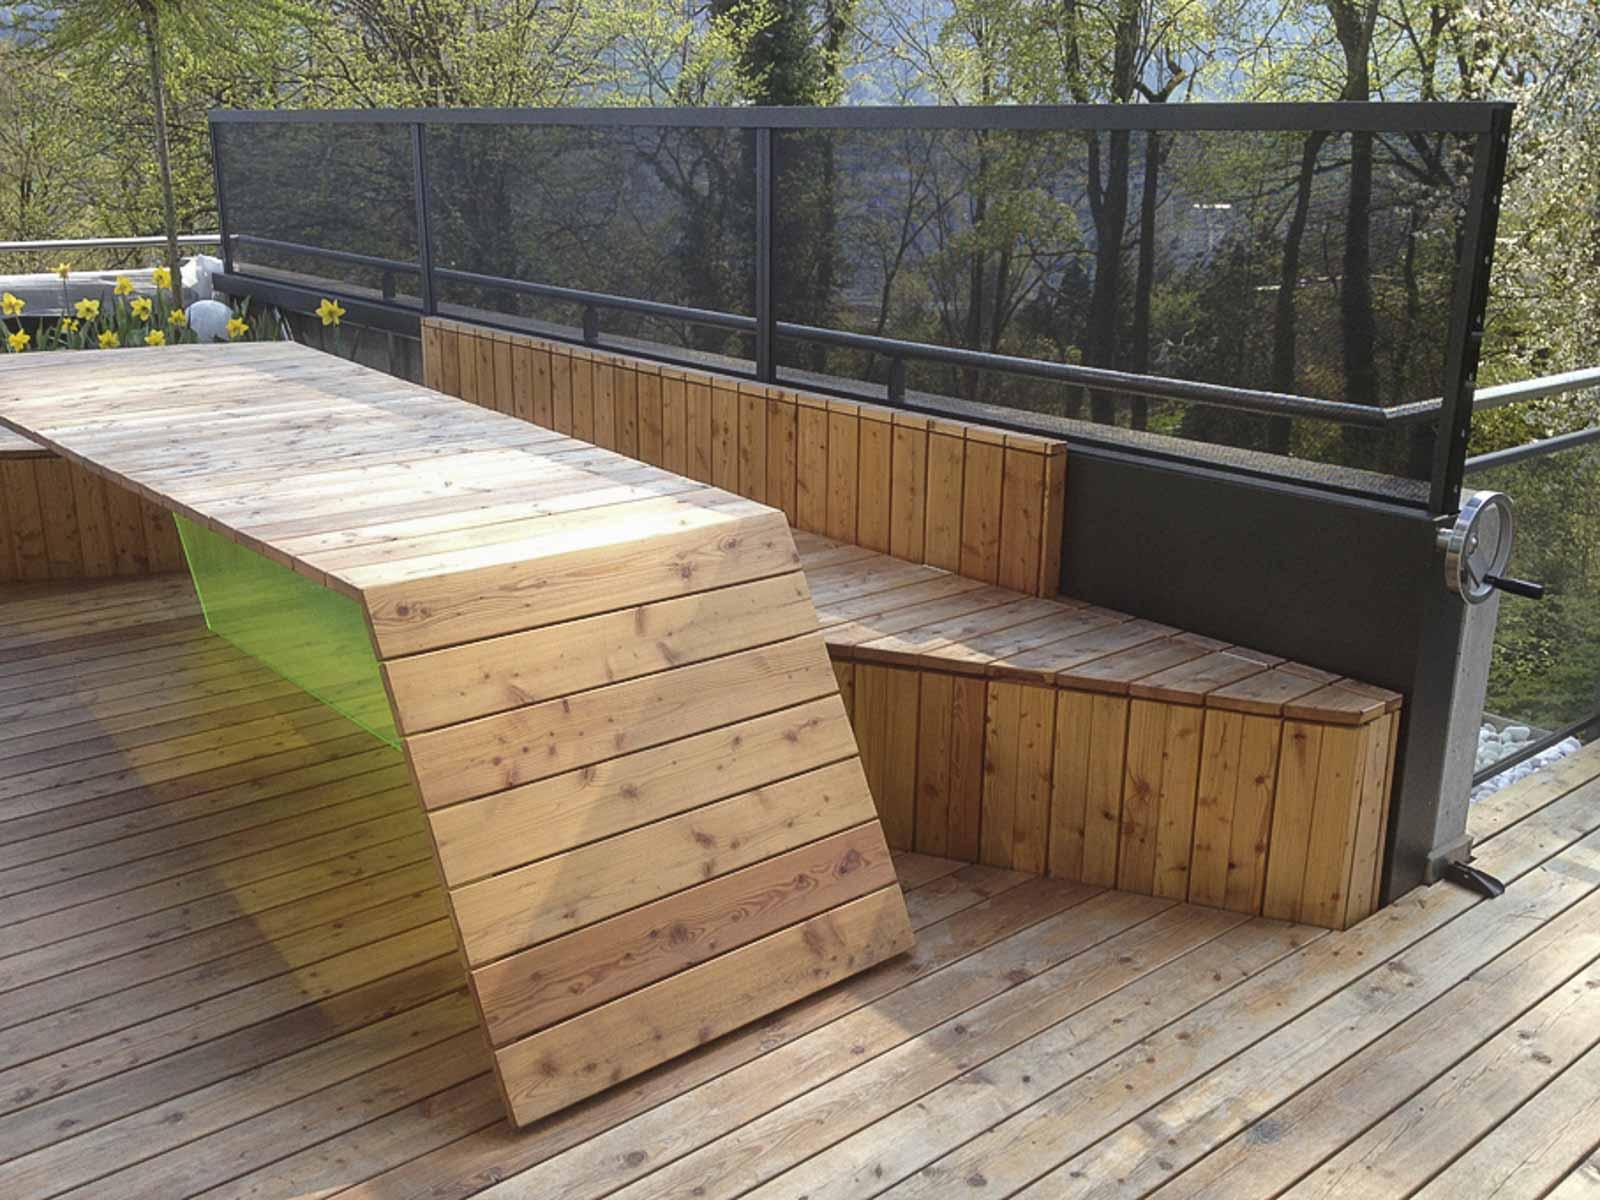 Wooddesign_Terrassengestaltung_Tisch_Sitzbank-Windschutz_ Naturholz_Lärchenholz vergraut (7)